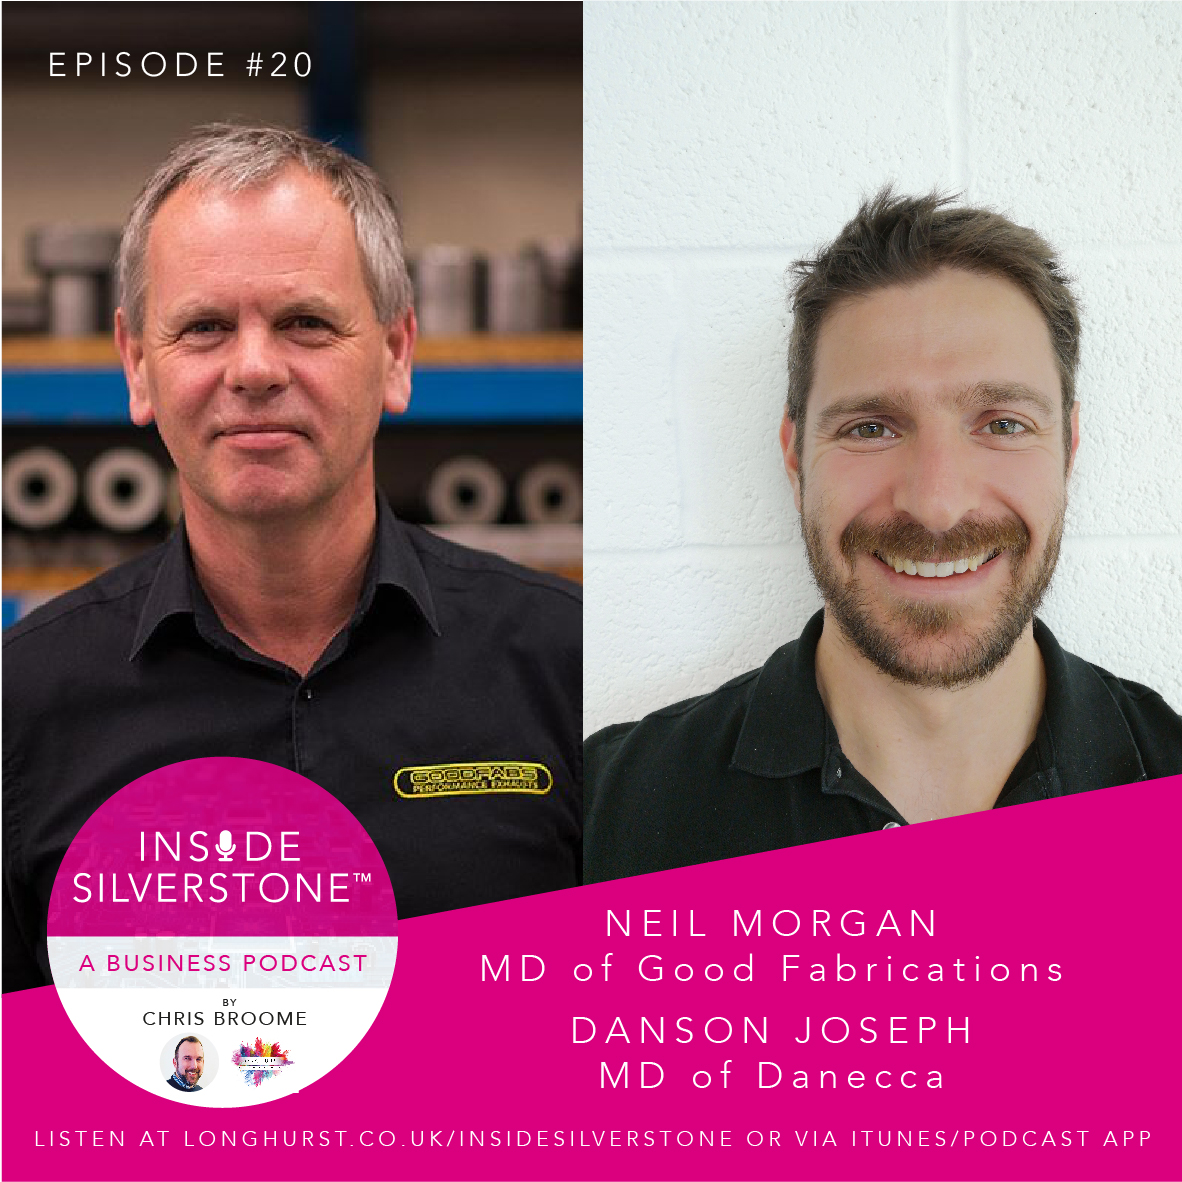 Neil Morgan - MD of Good Fabrications & Danson Joseph - MD of Danecca